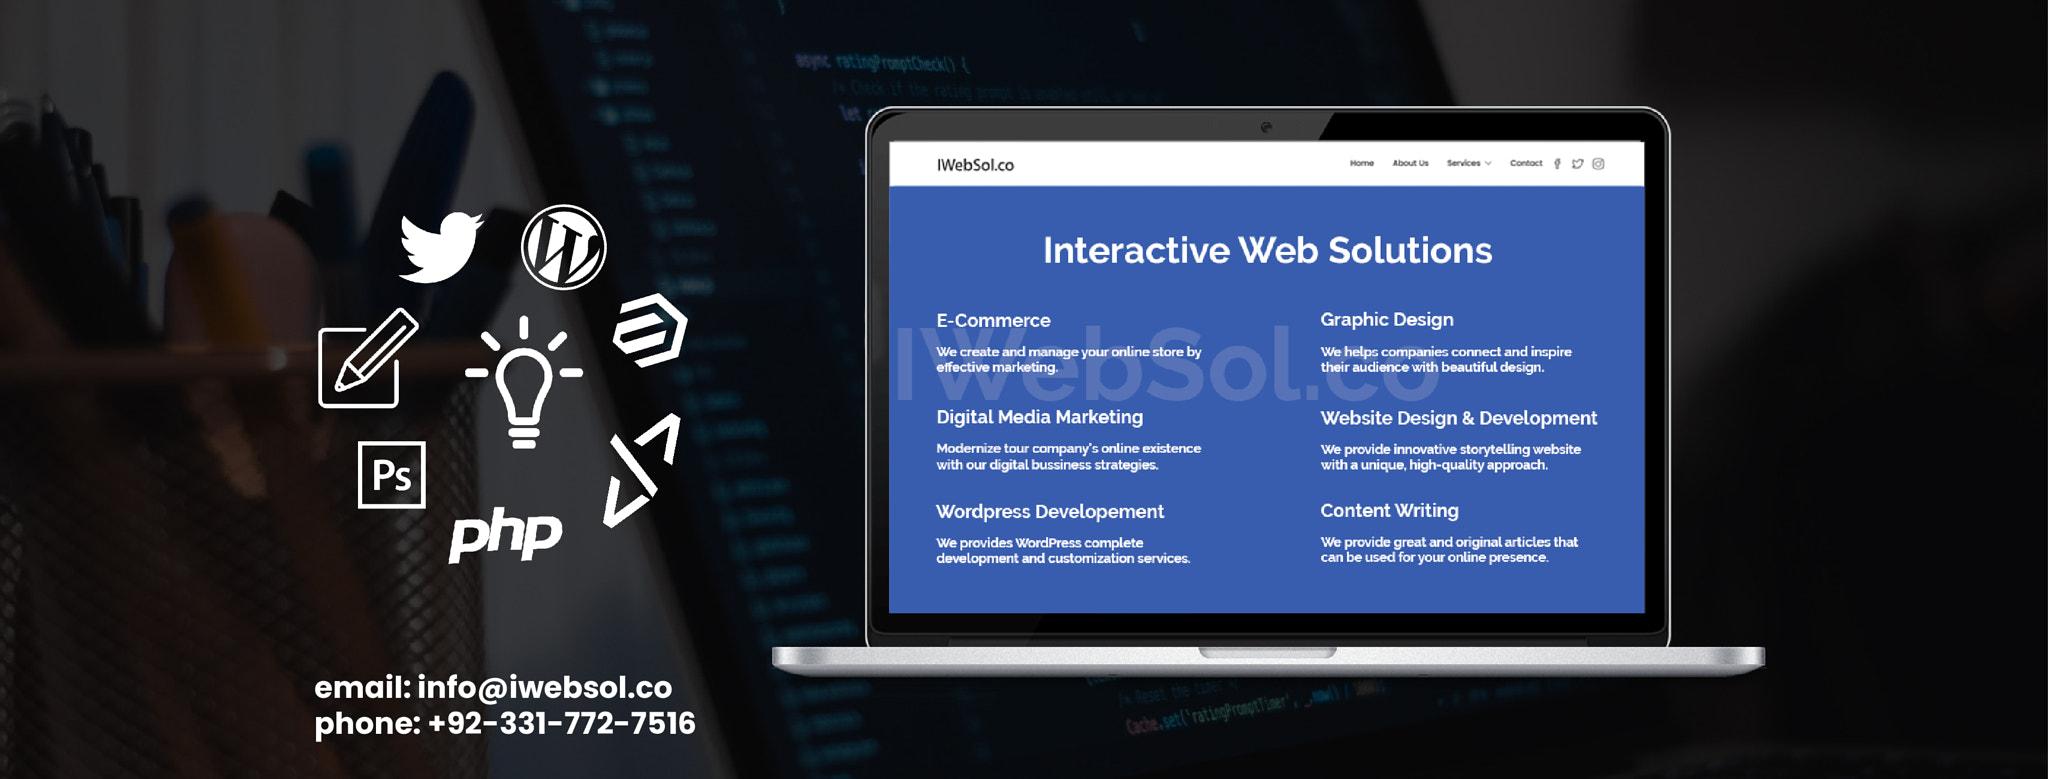 Website Design & Development Company - iWebSol